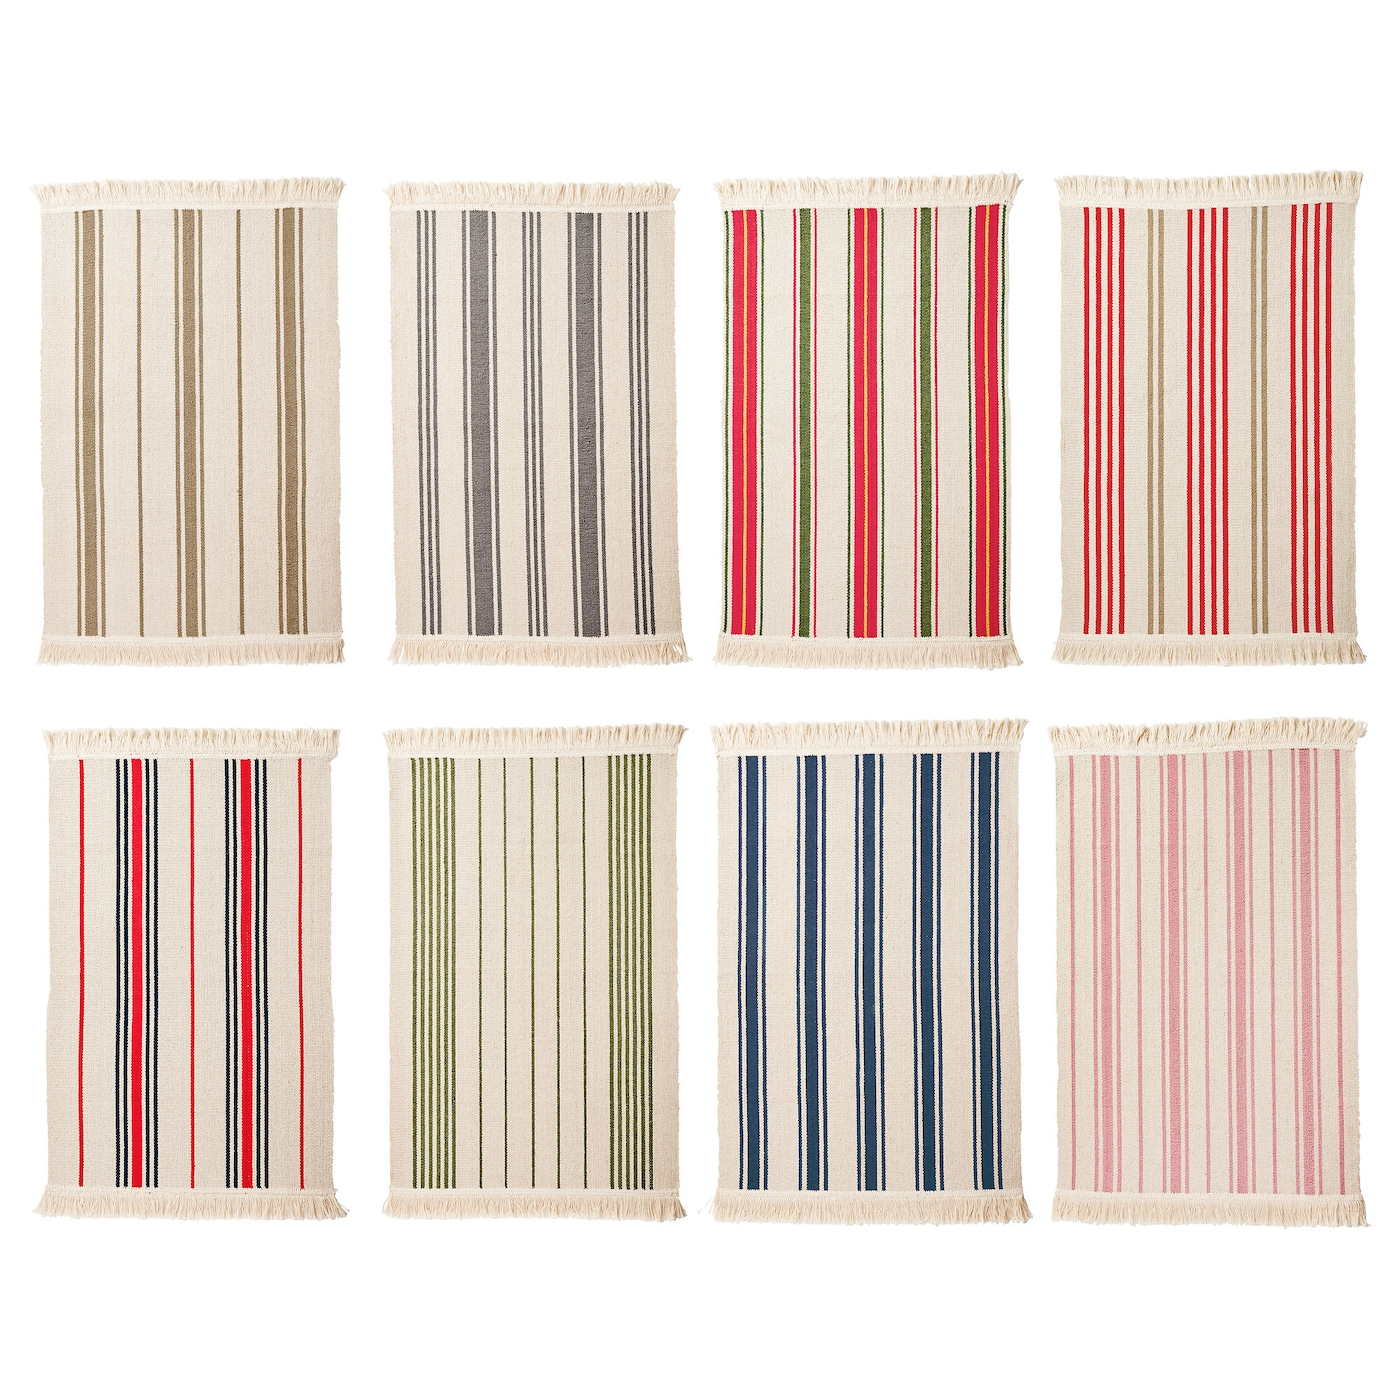 signe tapis tiss plat coloris assortis 55x85 cm ikea. Black Bedroom Furniture Sets. Home Design Ideas